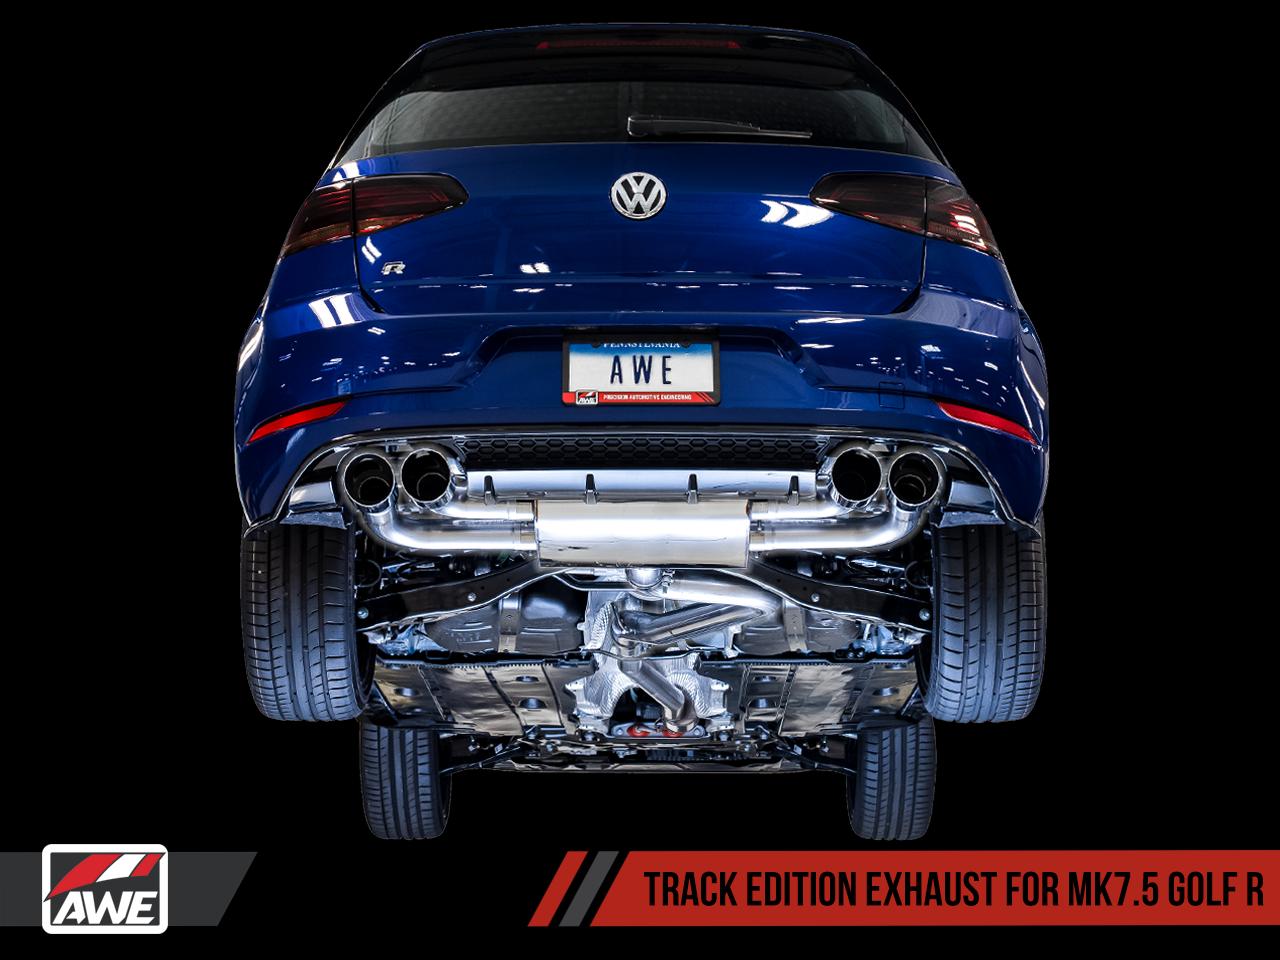 AWE Tuning Mk7 5 Golf 'R' Track Edition Exhaust